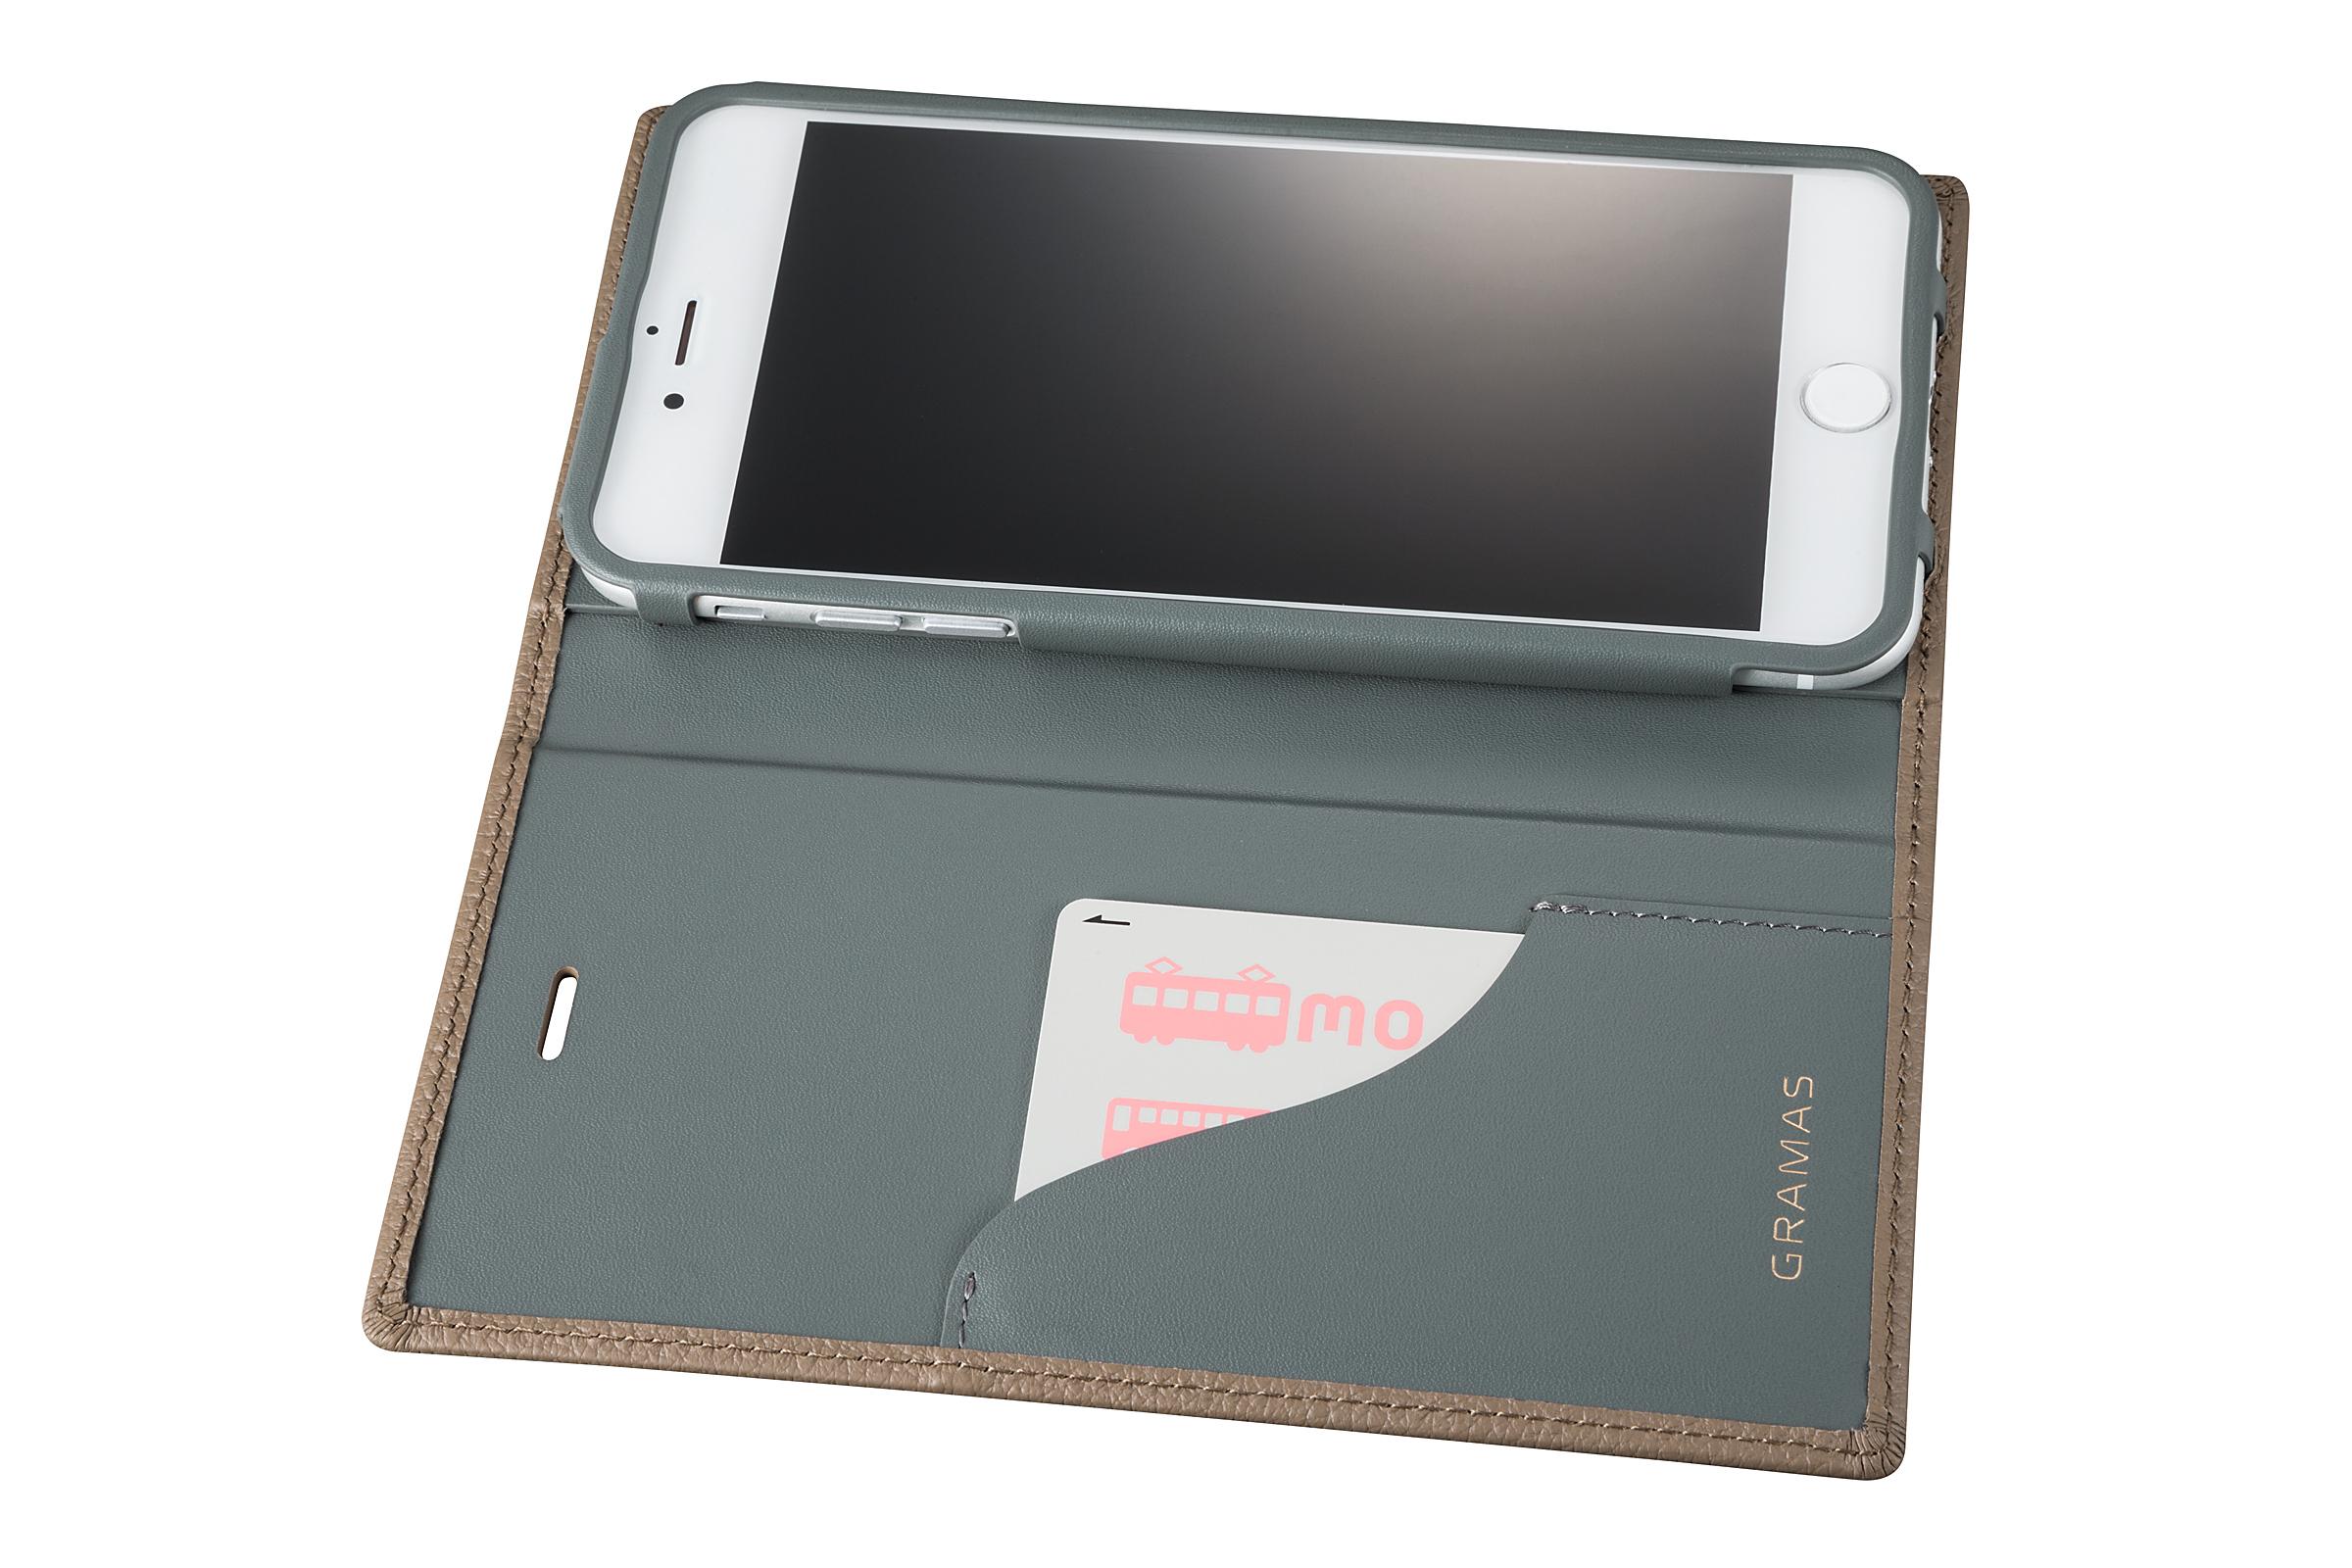 GRAMAS Shrunken-calf Full Leather Case for iPhone 7 Plus(Taupe(トープ)) シュランケンカーフ 手帳型フルレザーケース - 画像4